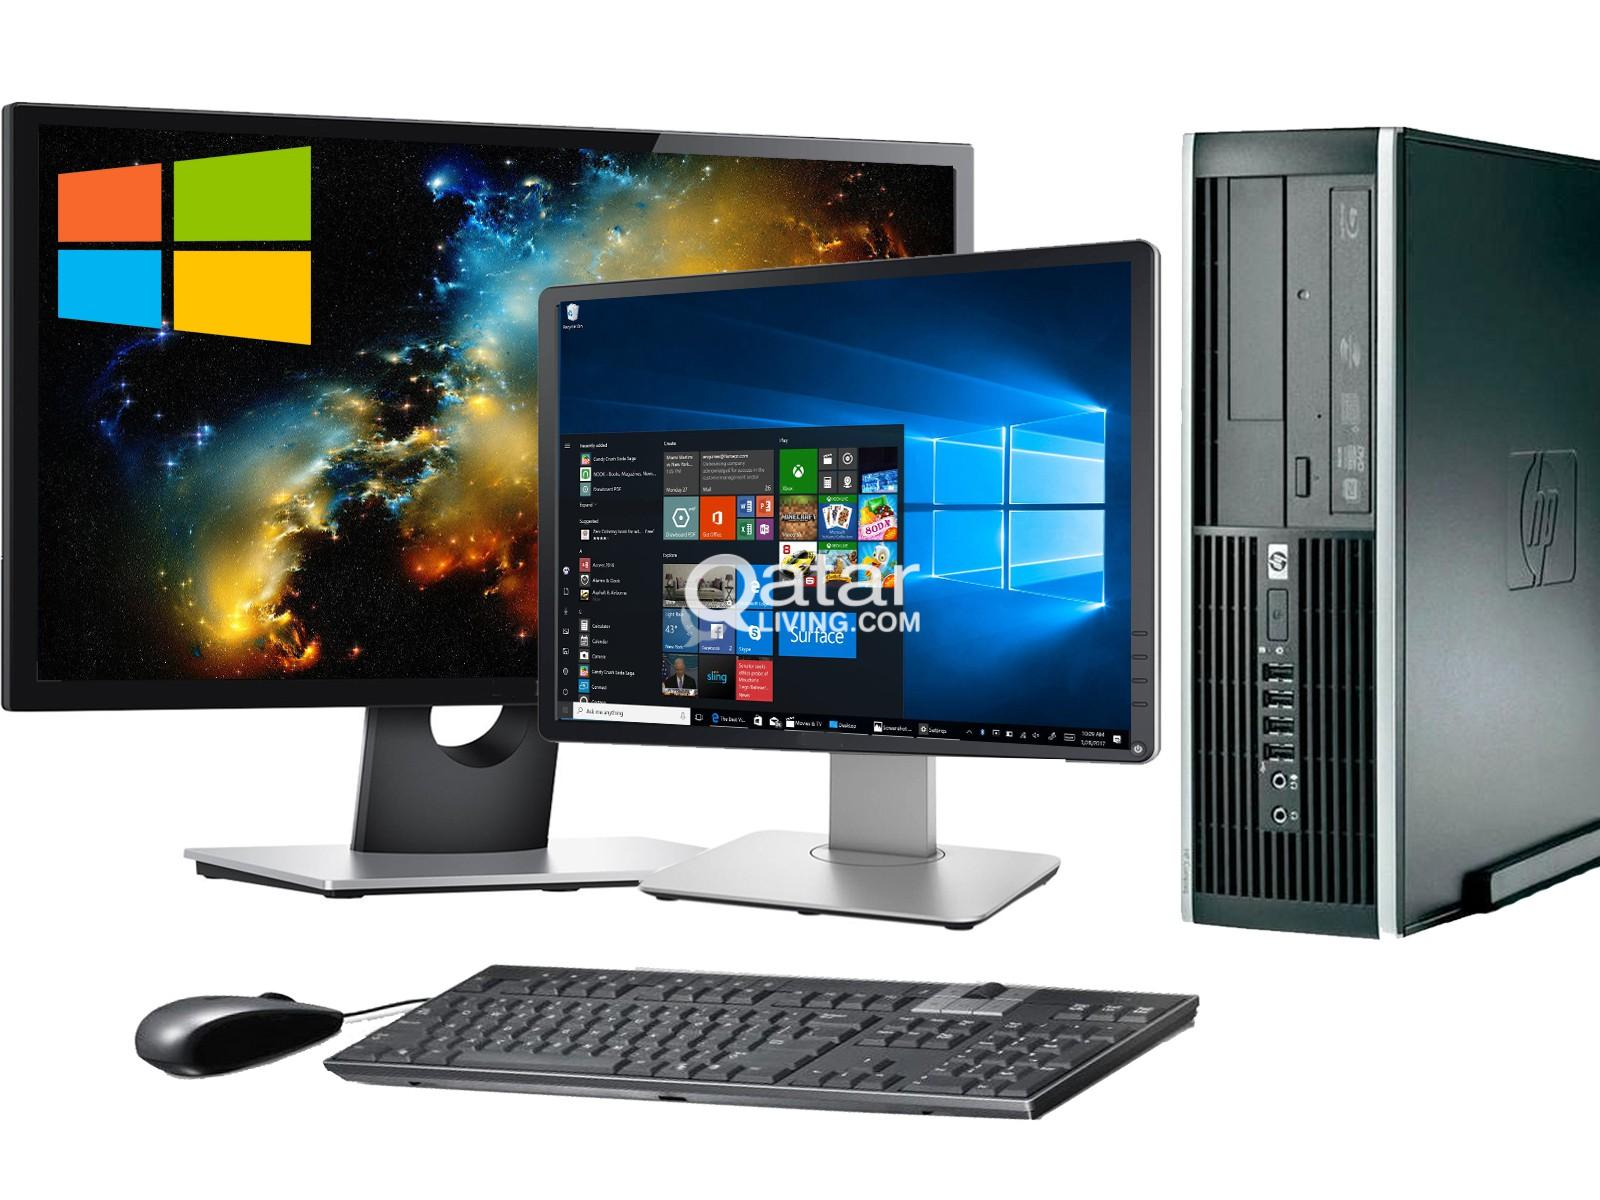 Hp i7 computer for sale | Qatar Living